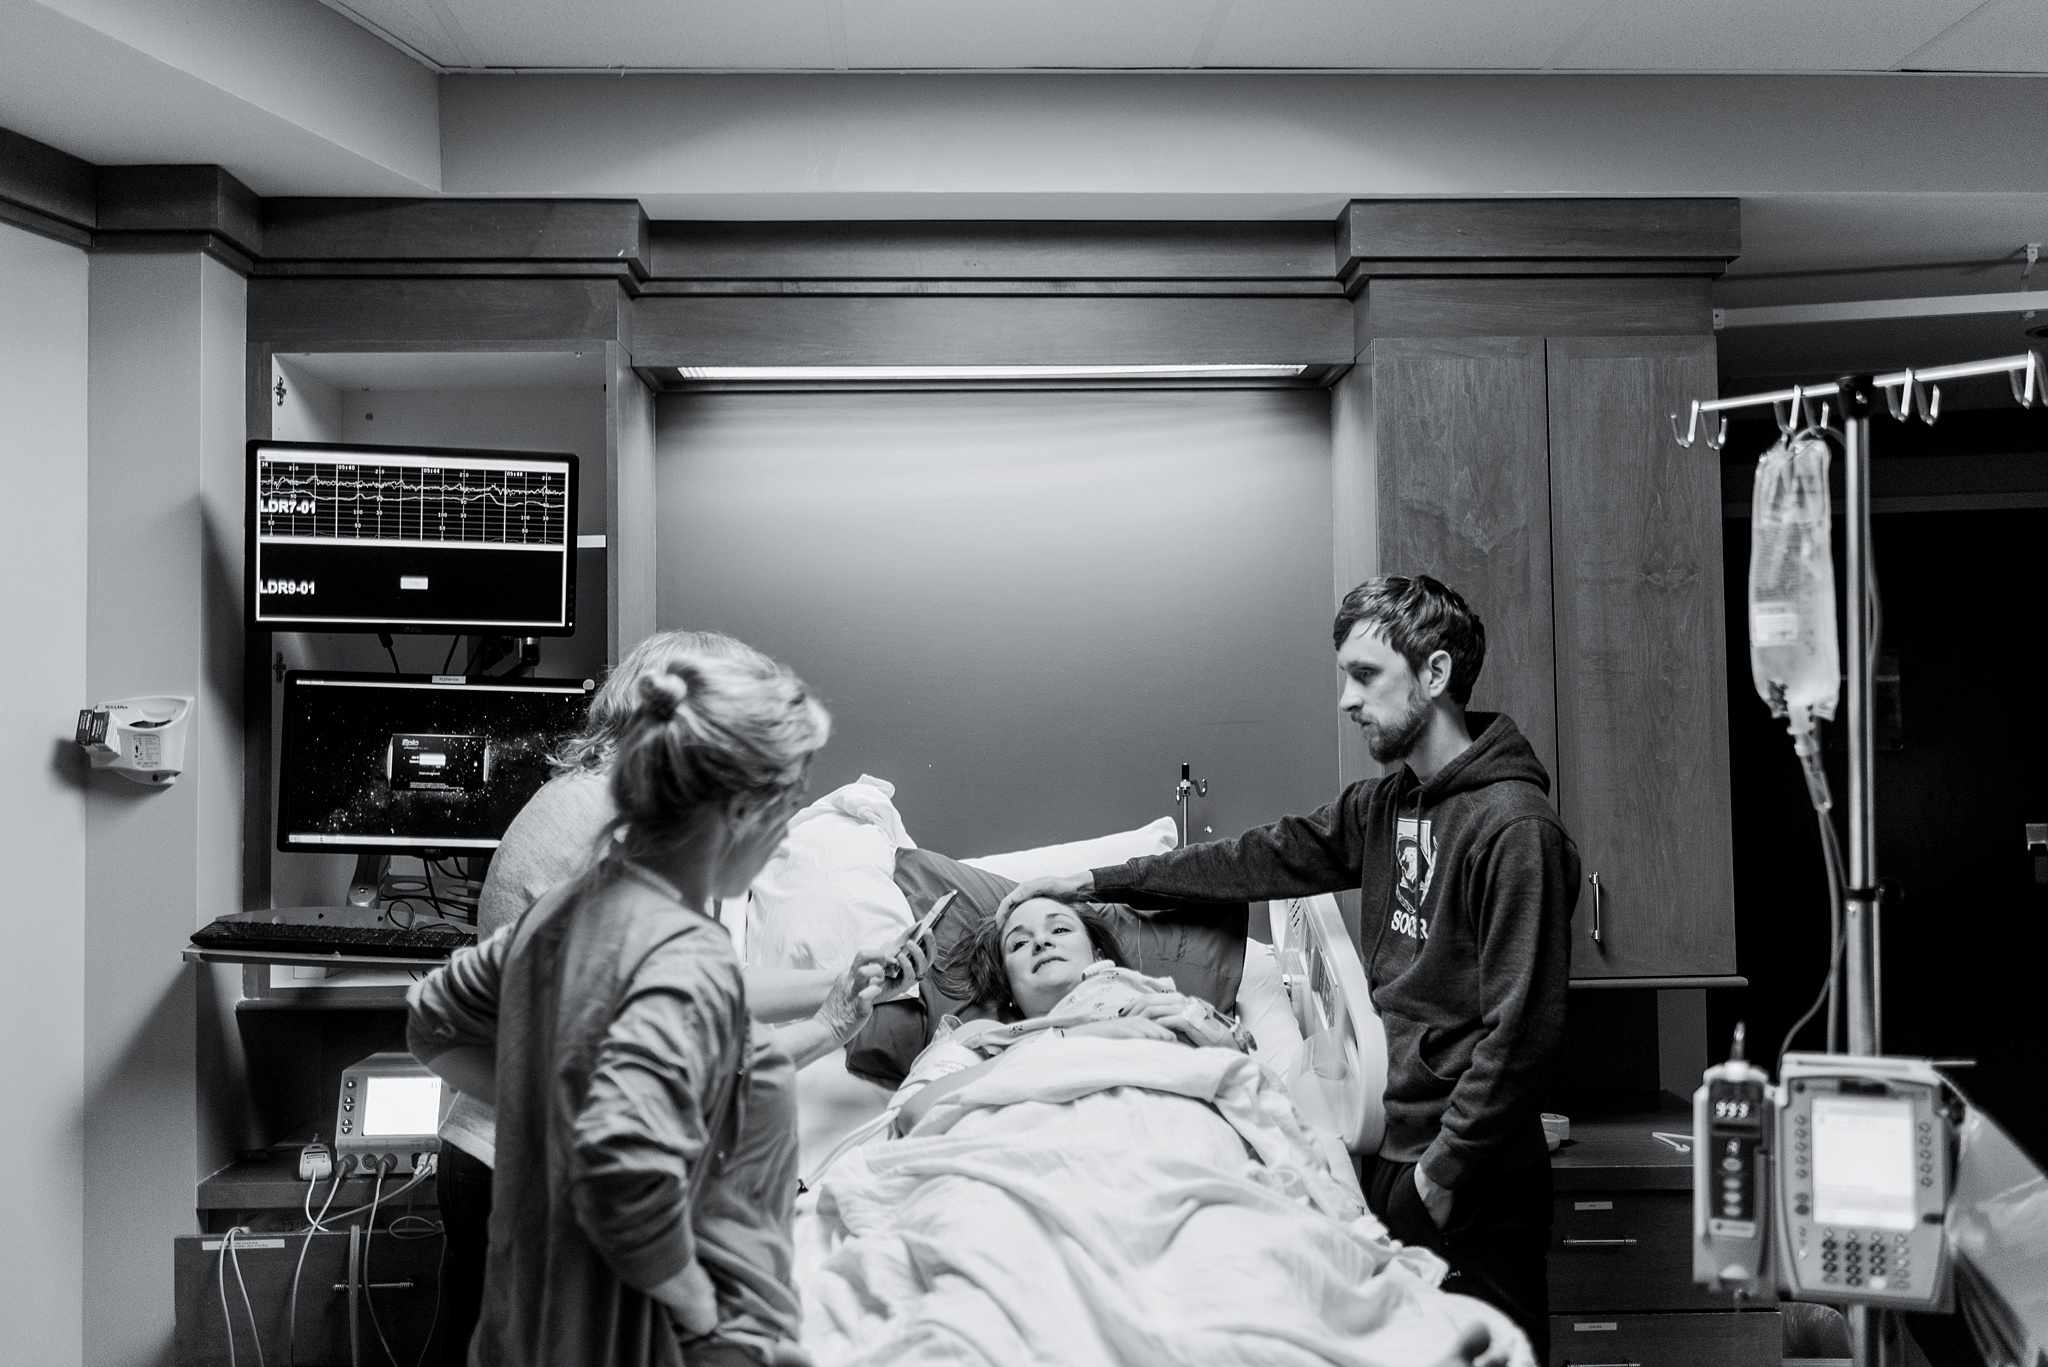 fayetteville-georgia-piedmont-fayette-hospital-birth-photography-sarahmoore-136.jpg